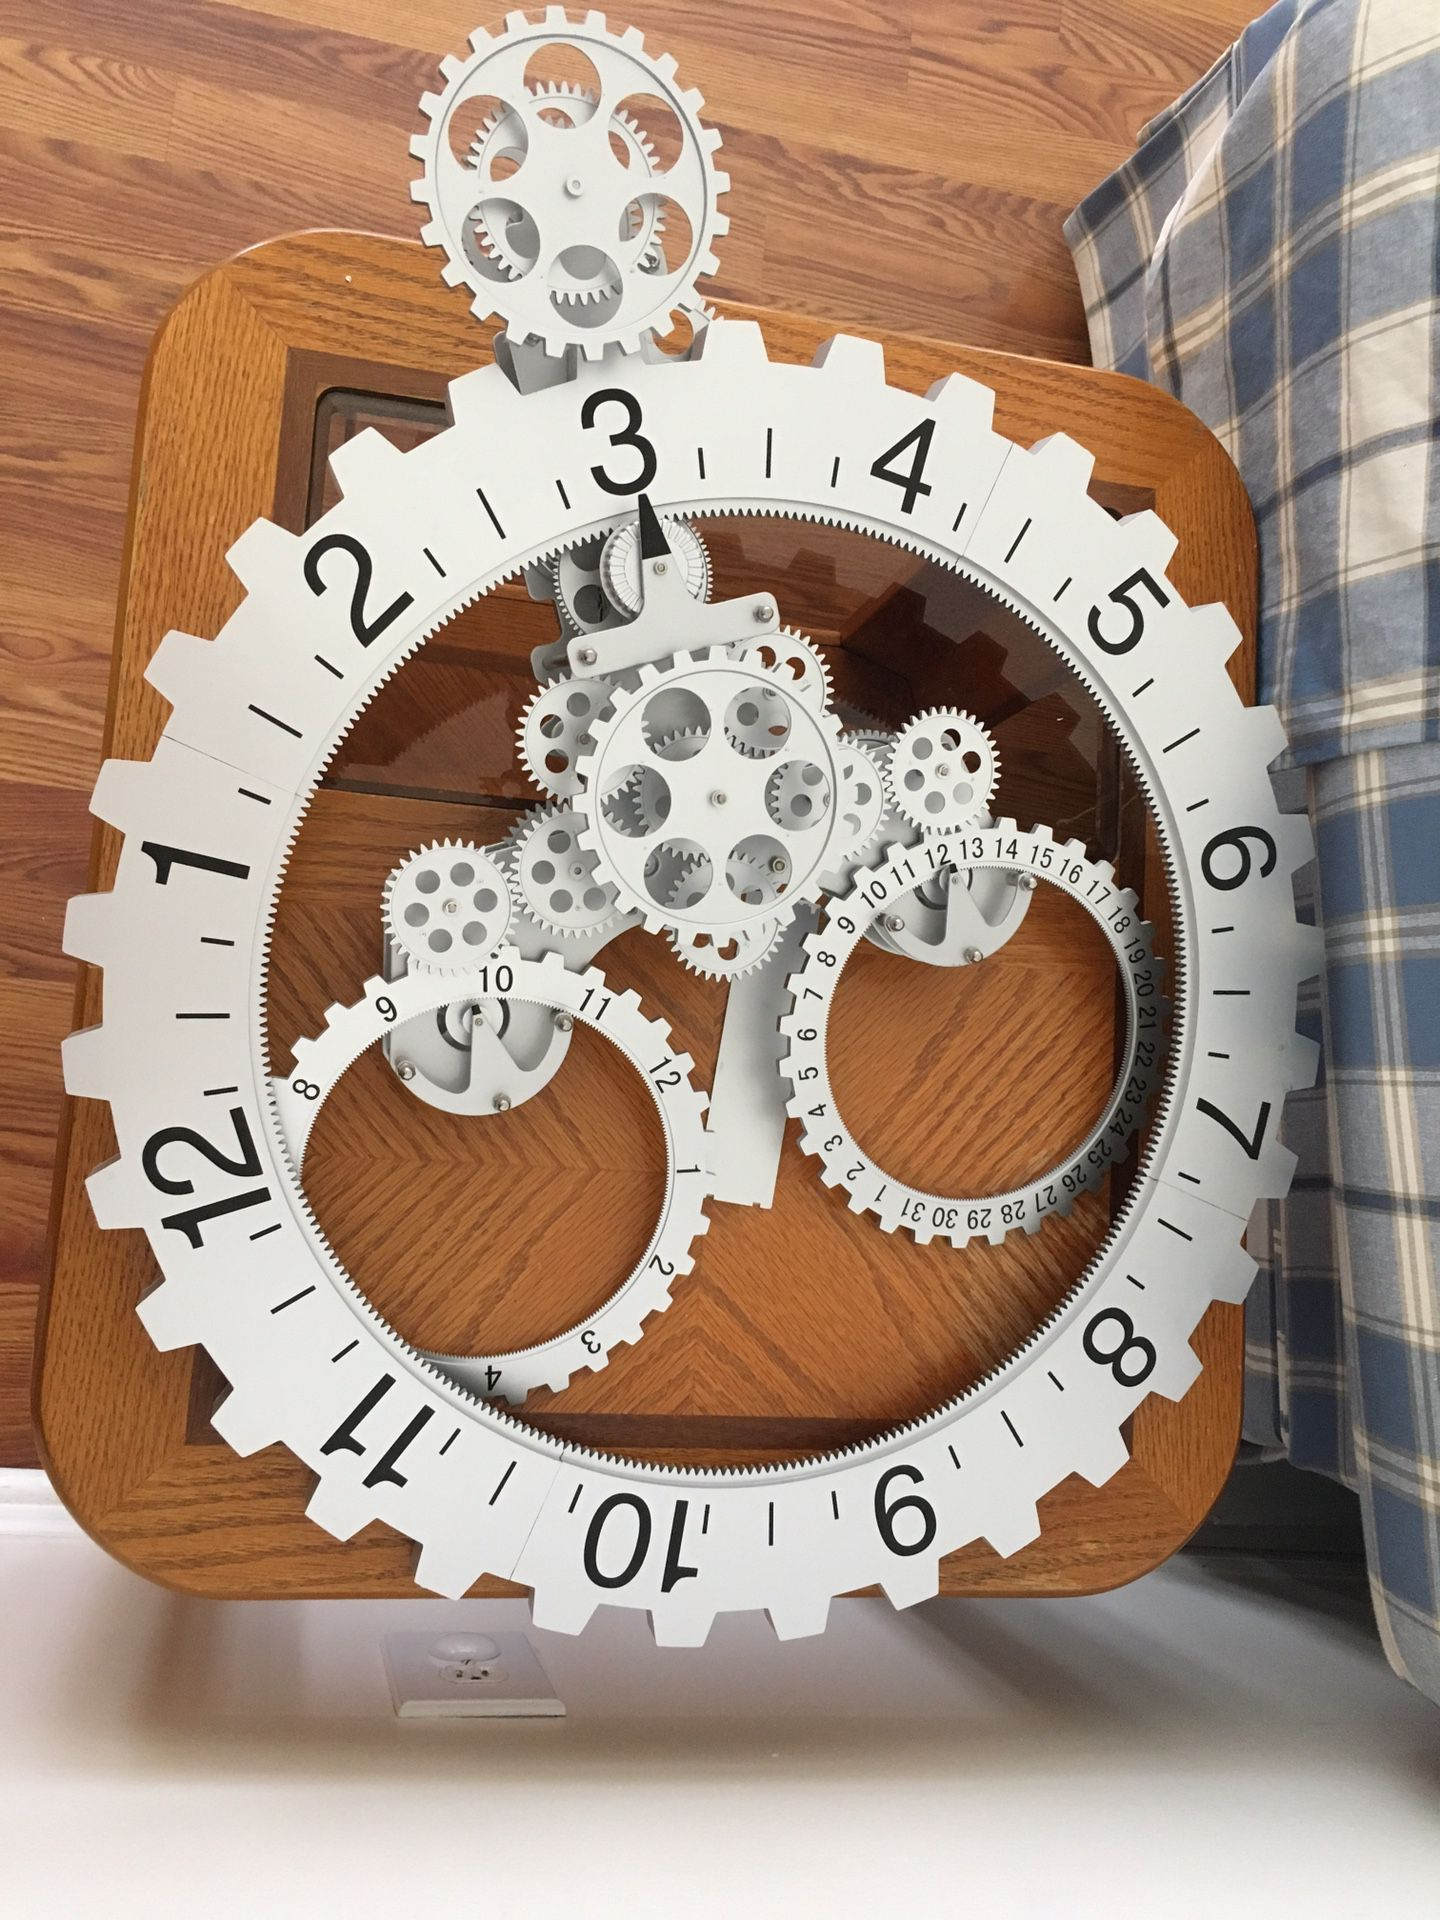 Engineering clock